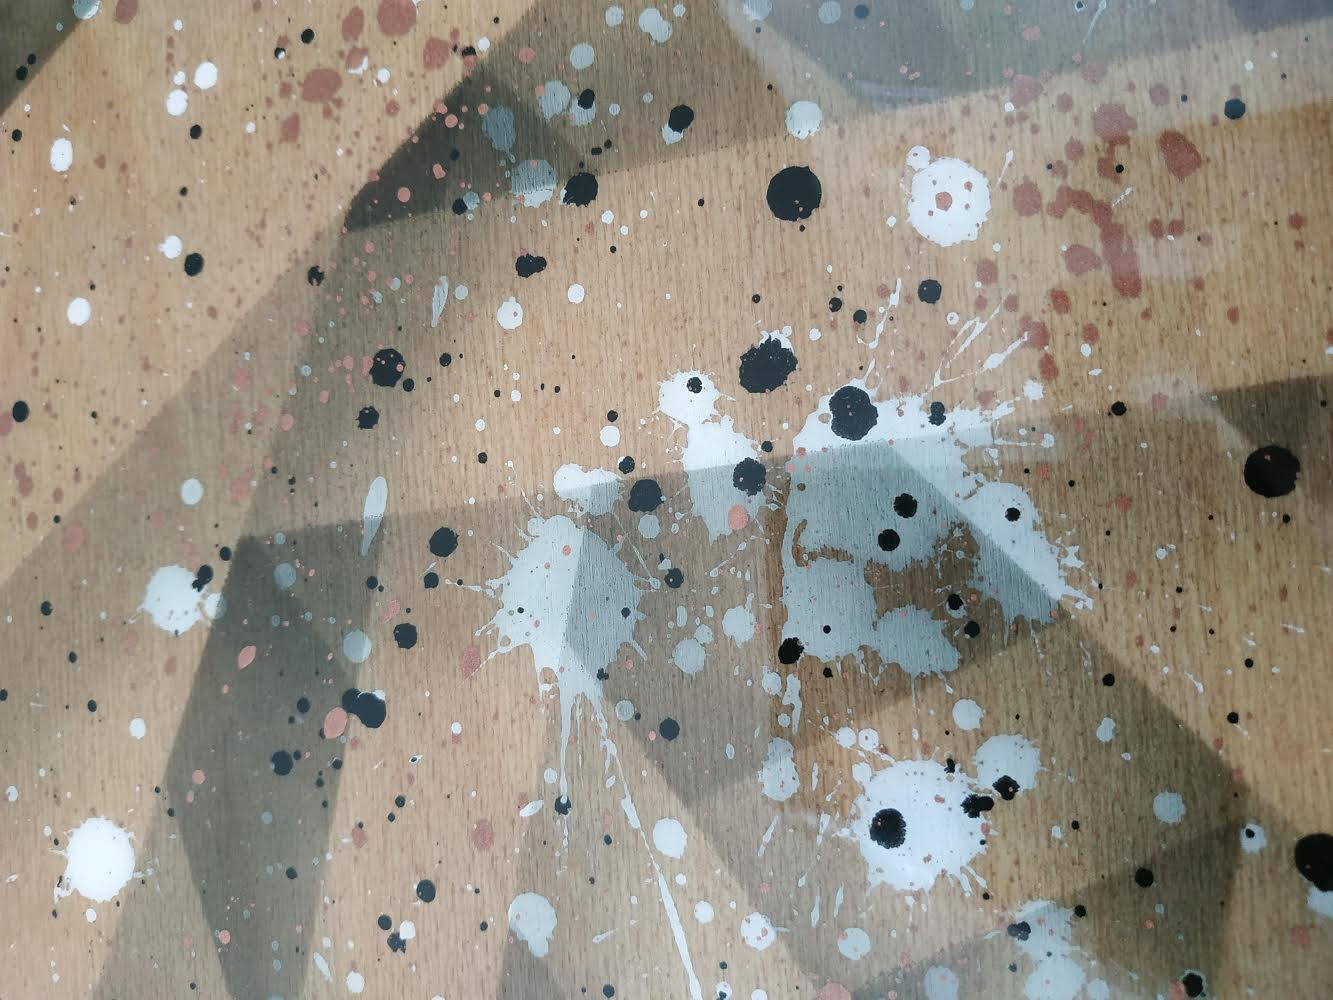 NINU 'MOOD SPIRIT'-2021- ORIGINAL 1/1 - Image 9 of 9